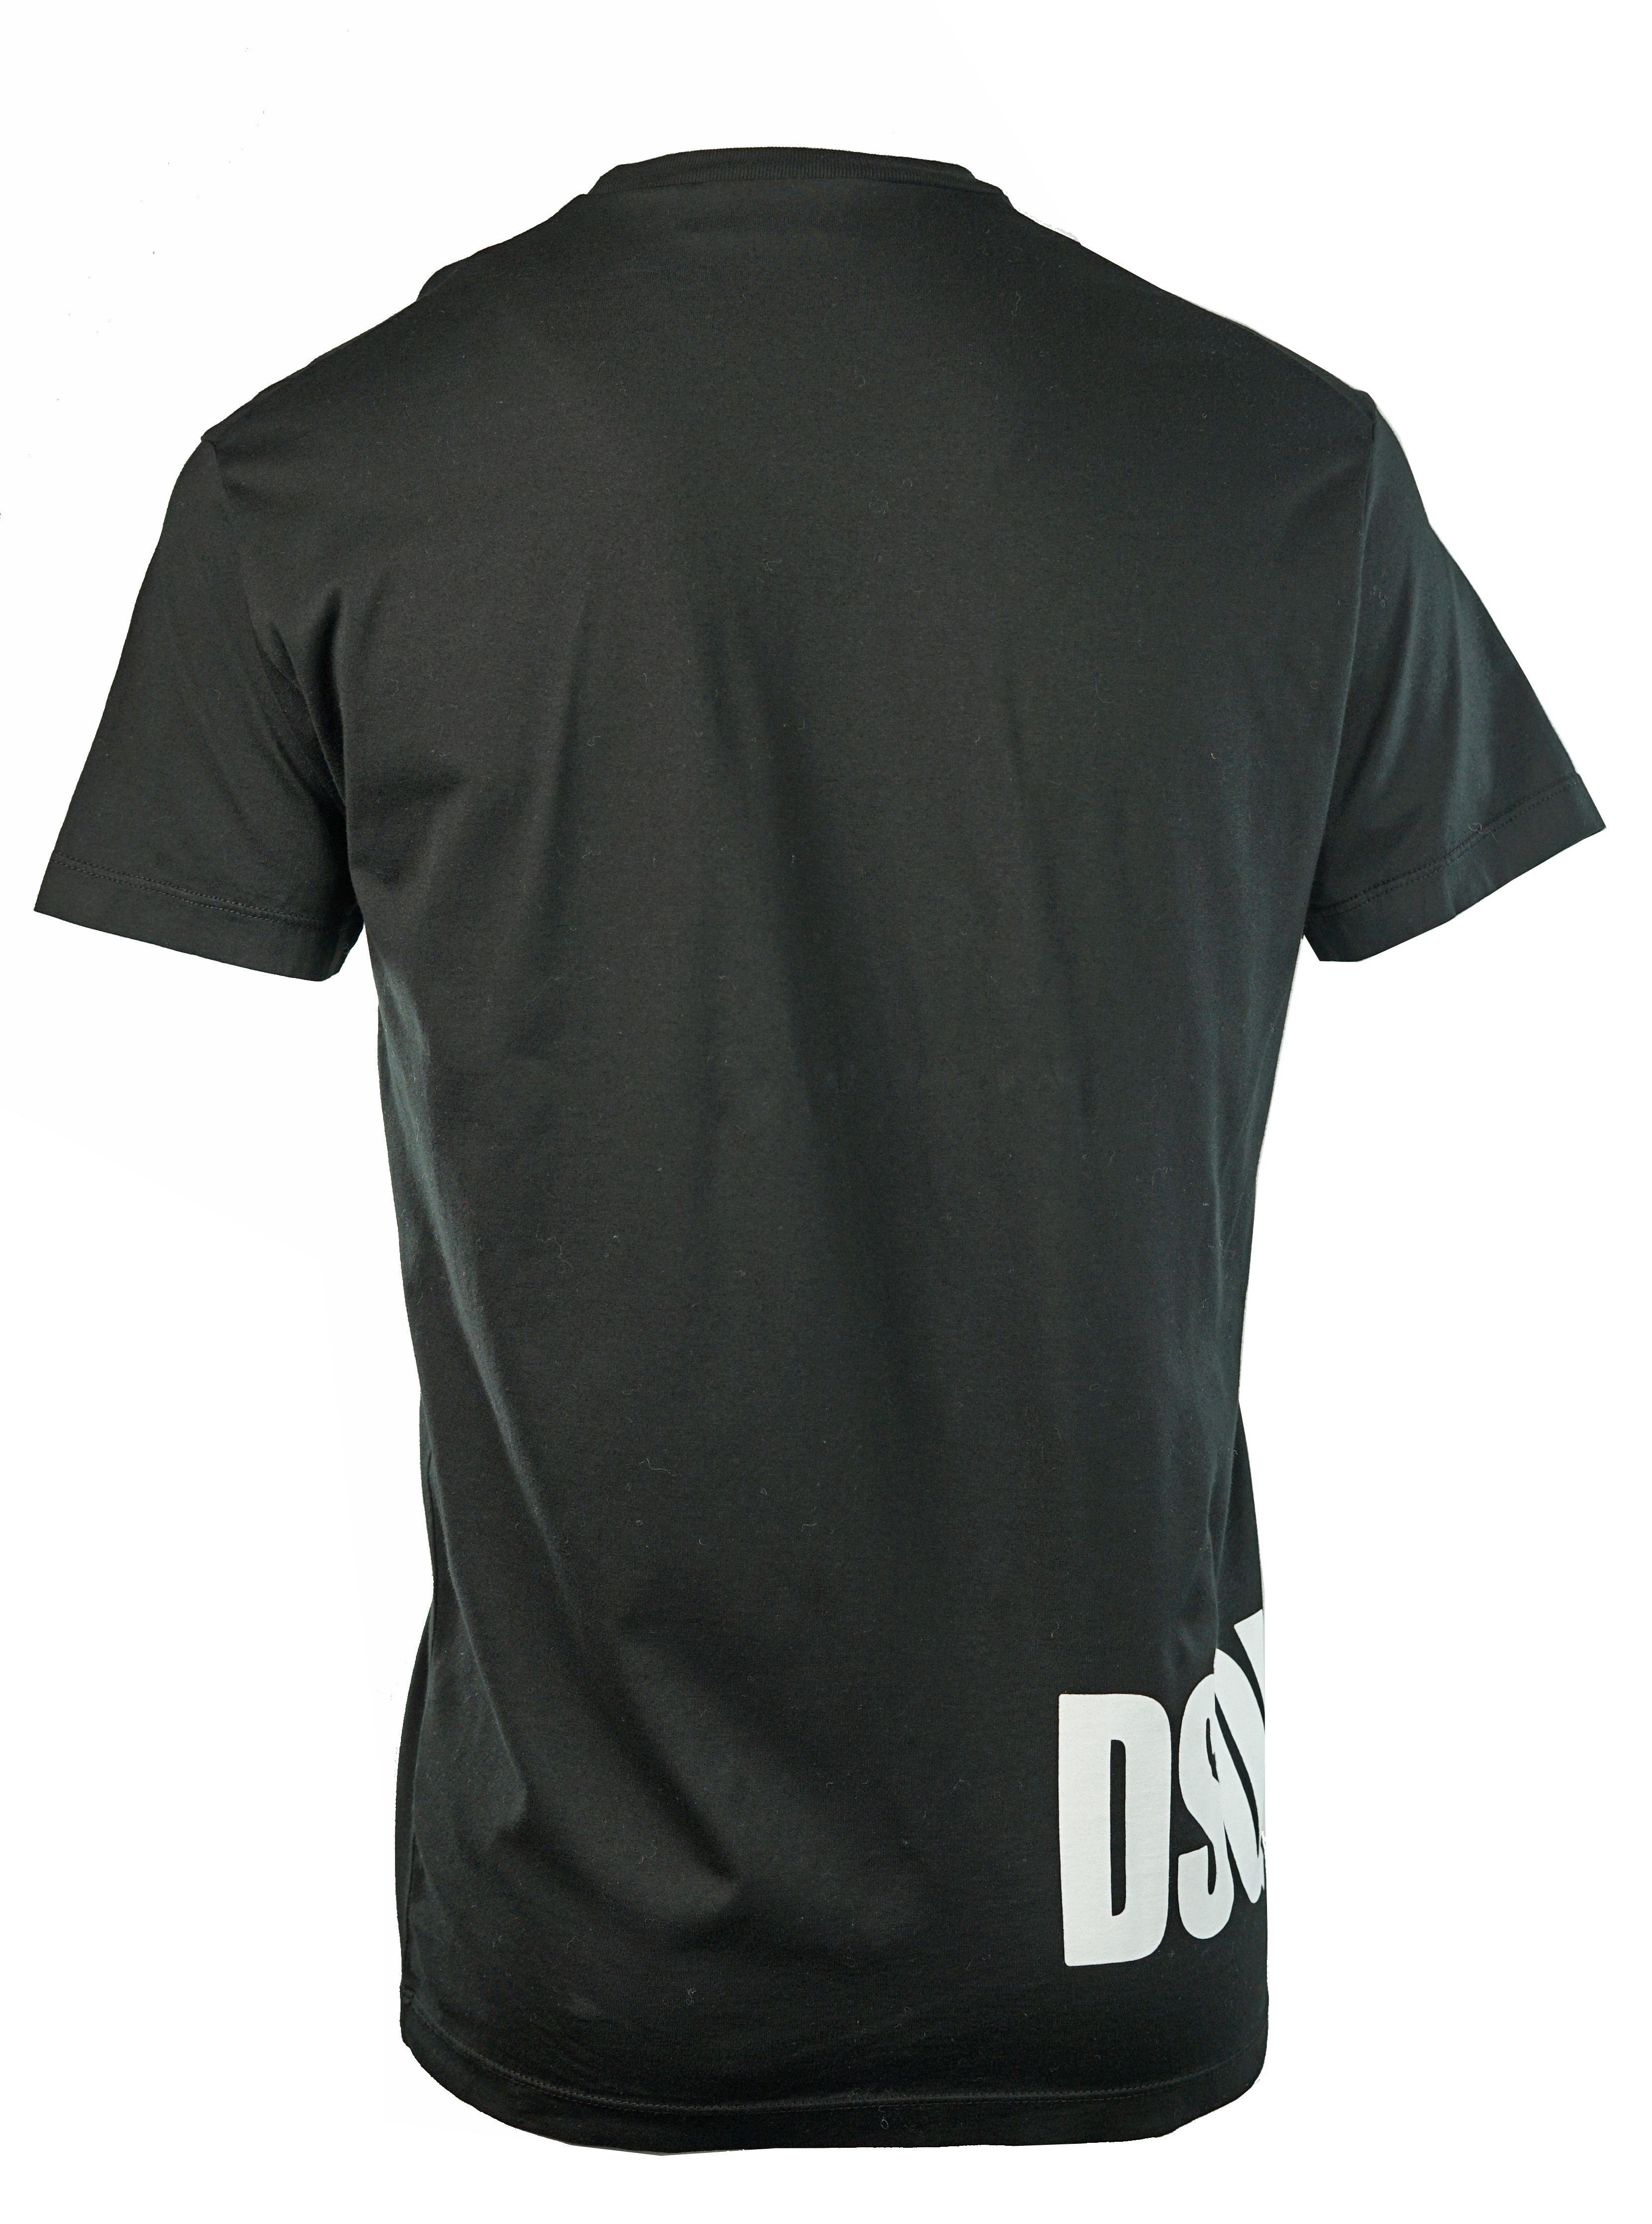 DSquared2 S74GD0463 S22427 900 T-Shirt